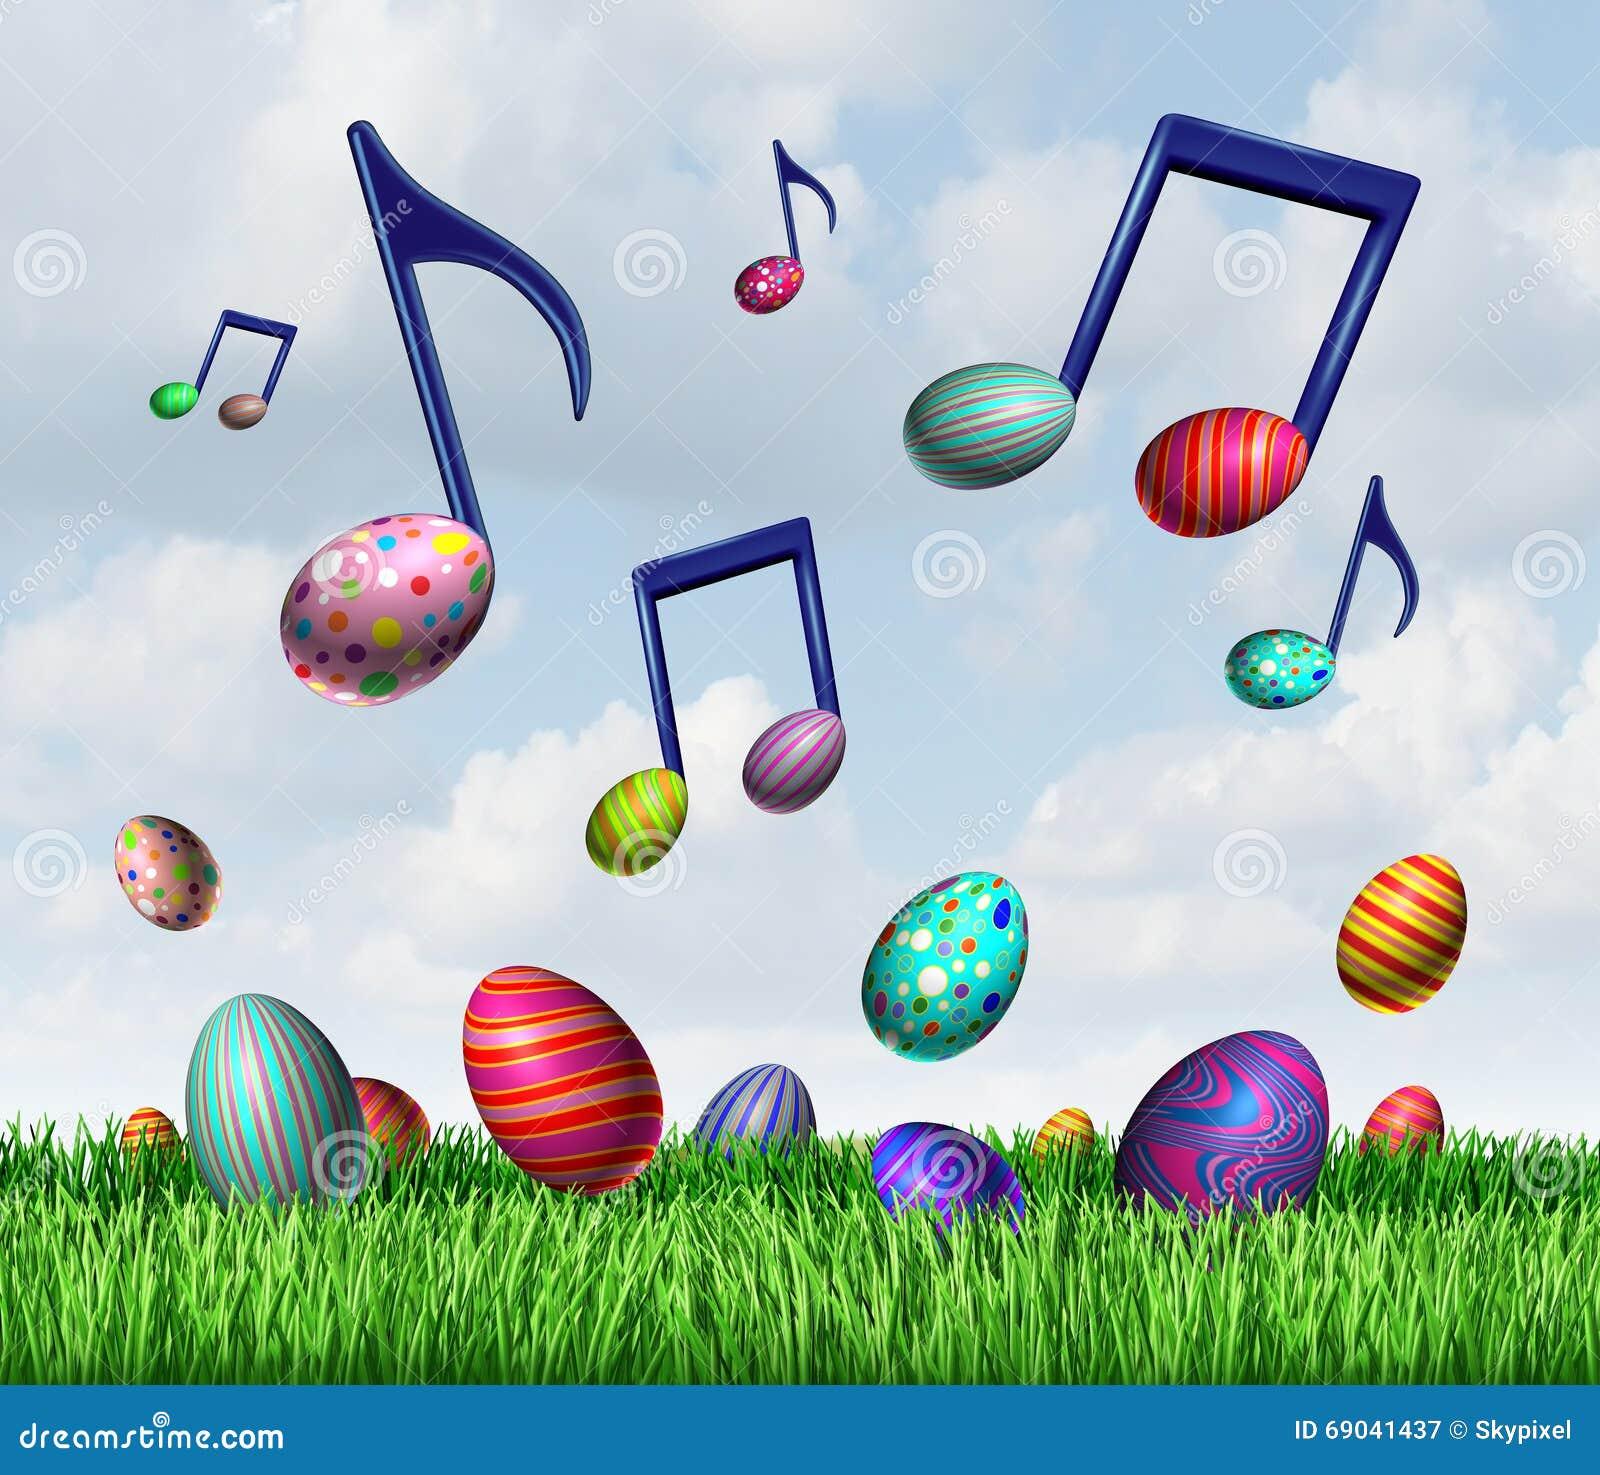 ... notes representing a happy joyful springtime traditional celebration